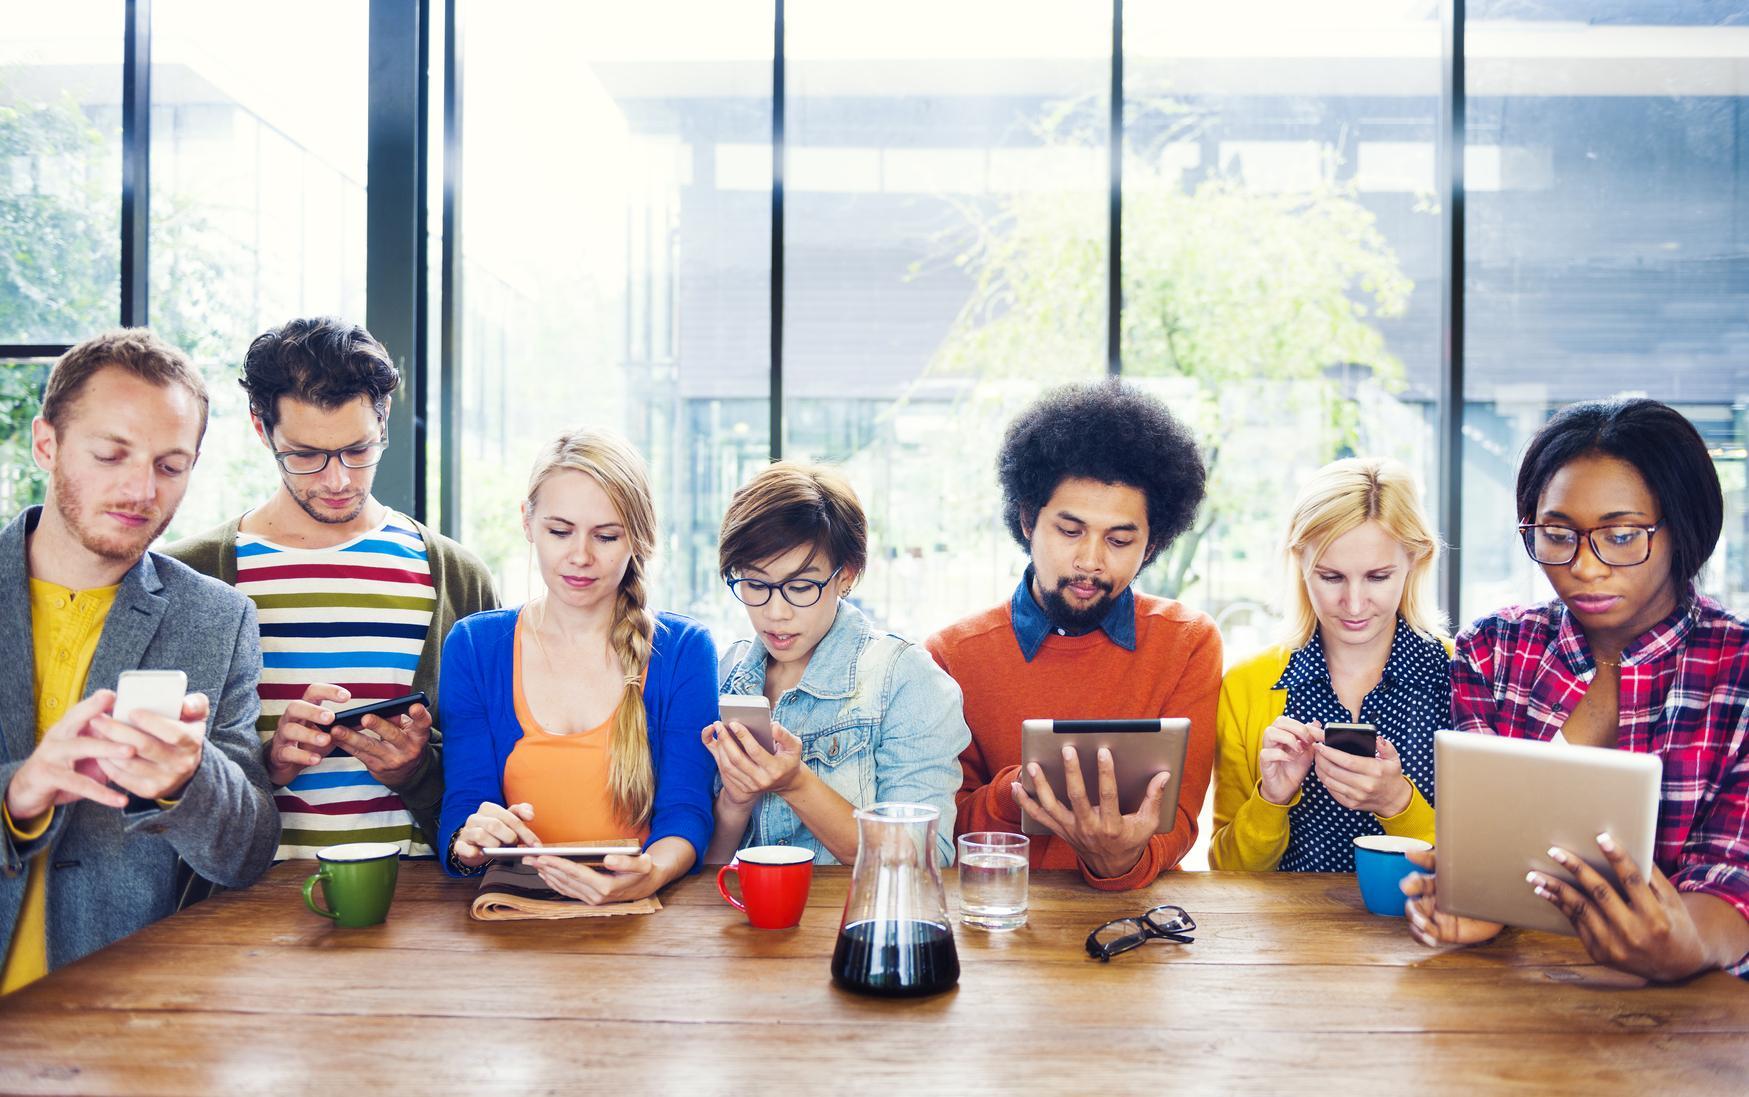 Grupo de personas usando dispositivos electrónicos